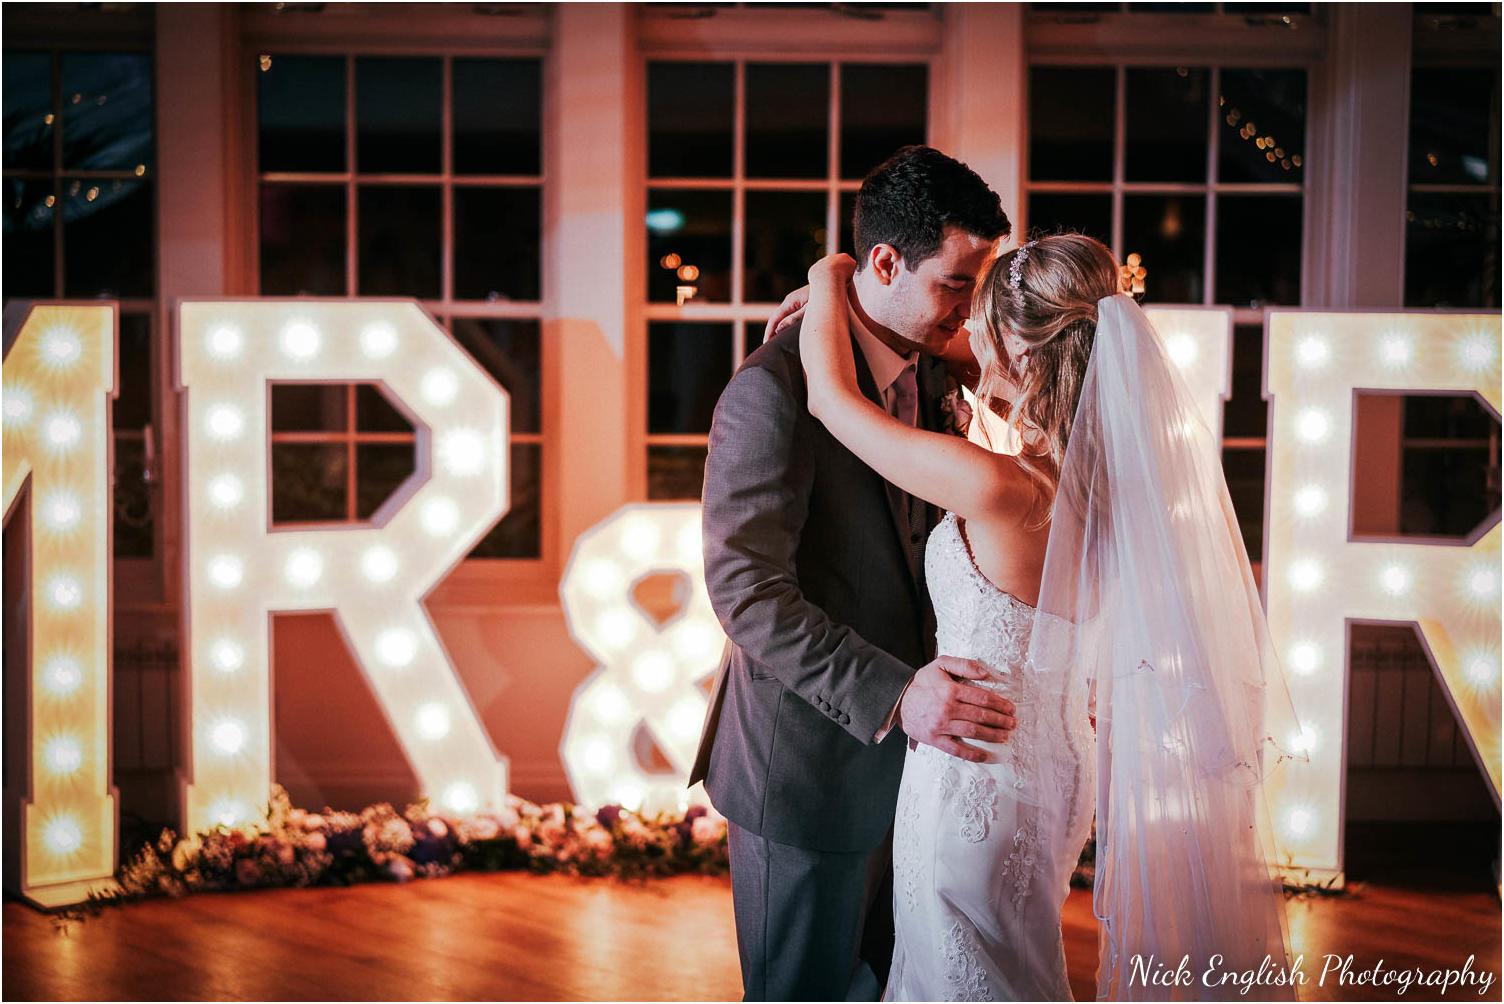 Mitton_Hall_Wedding_Photographer_2018-169.jpg